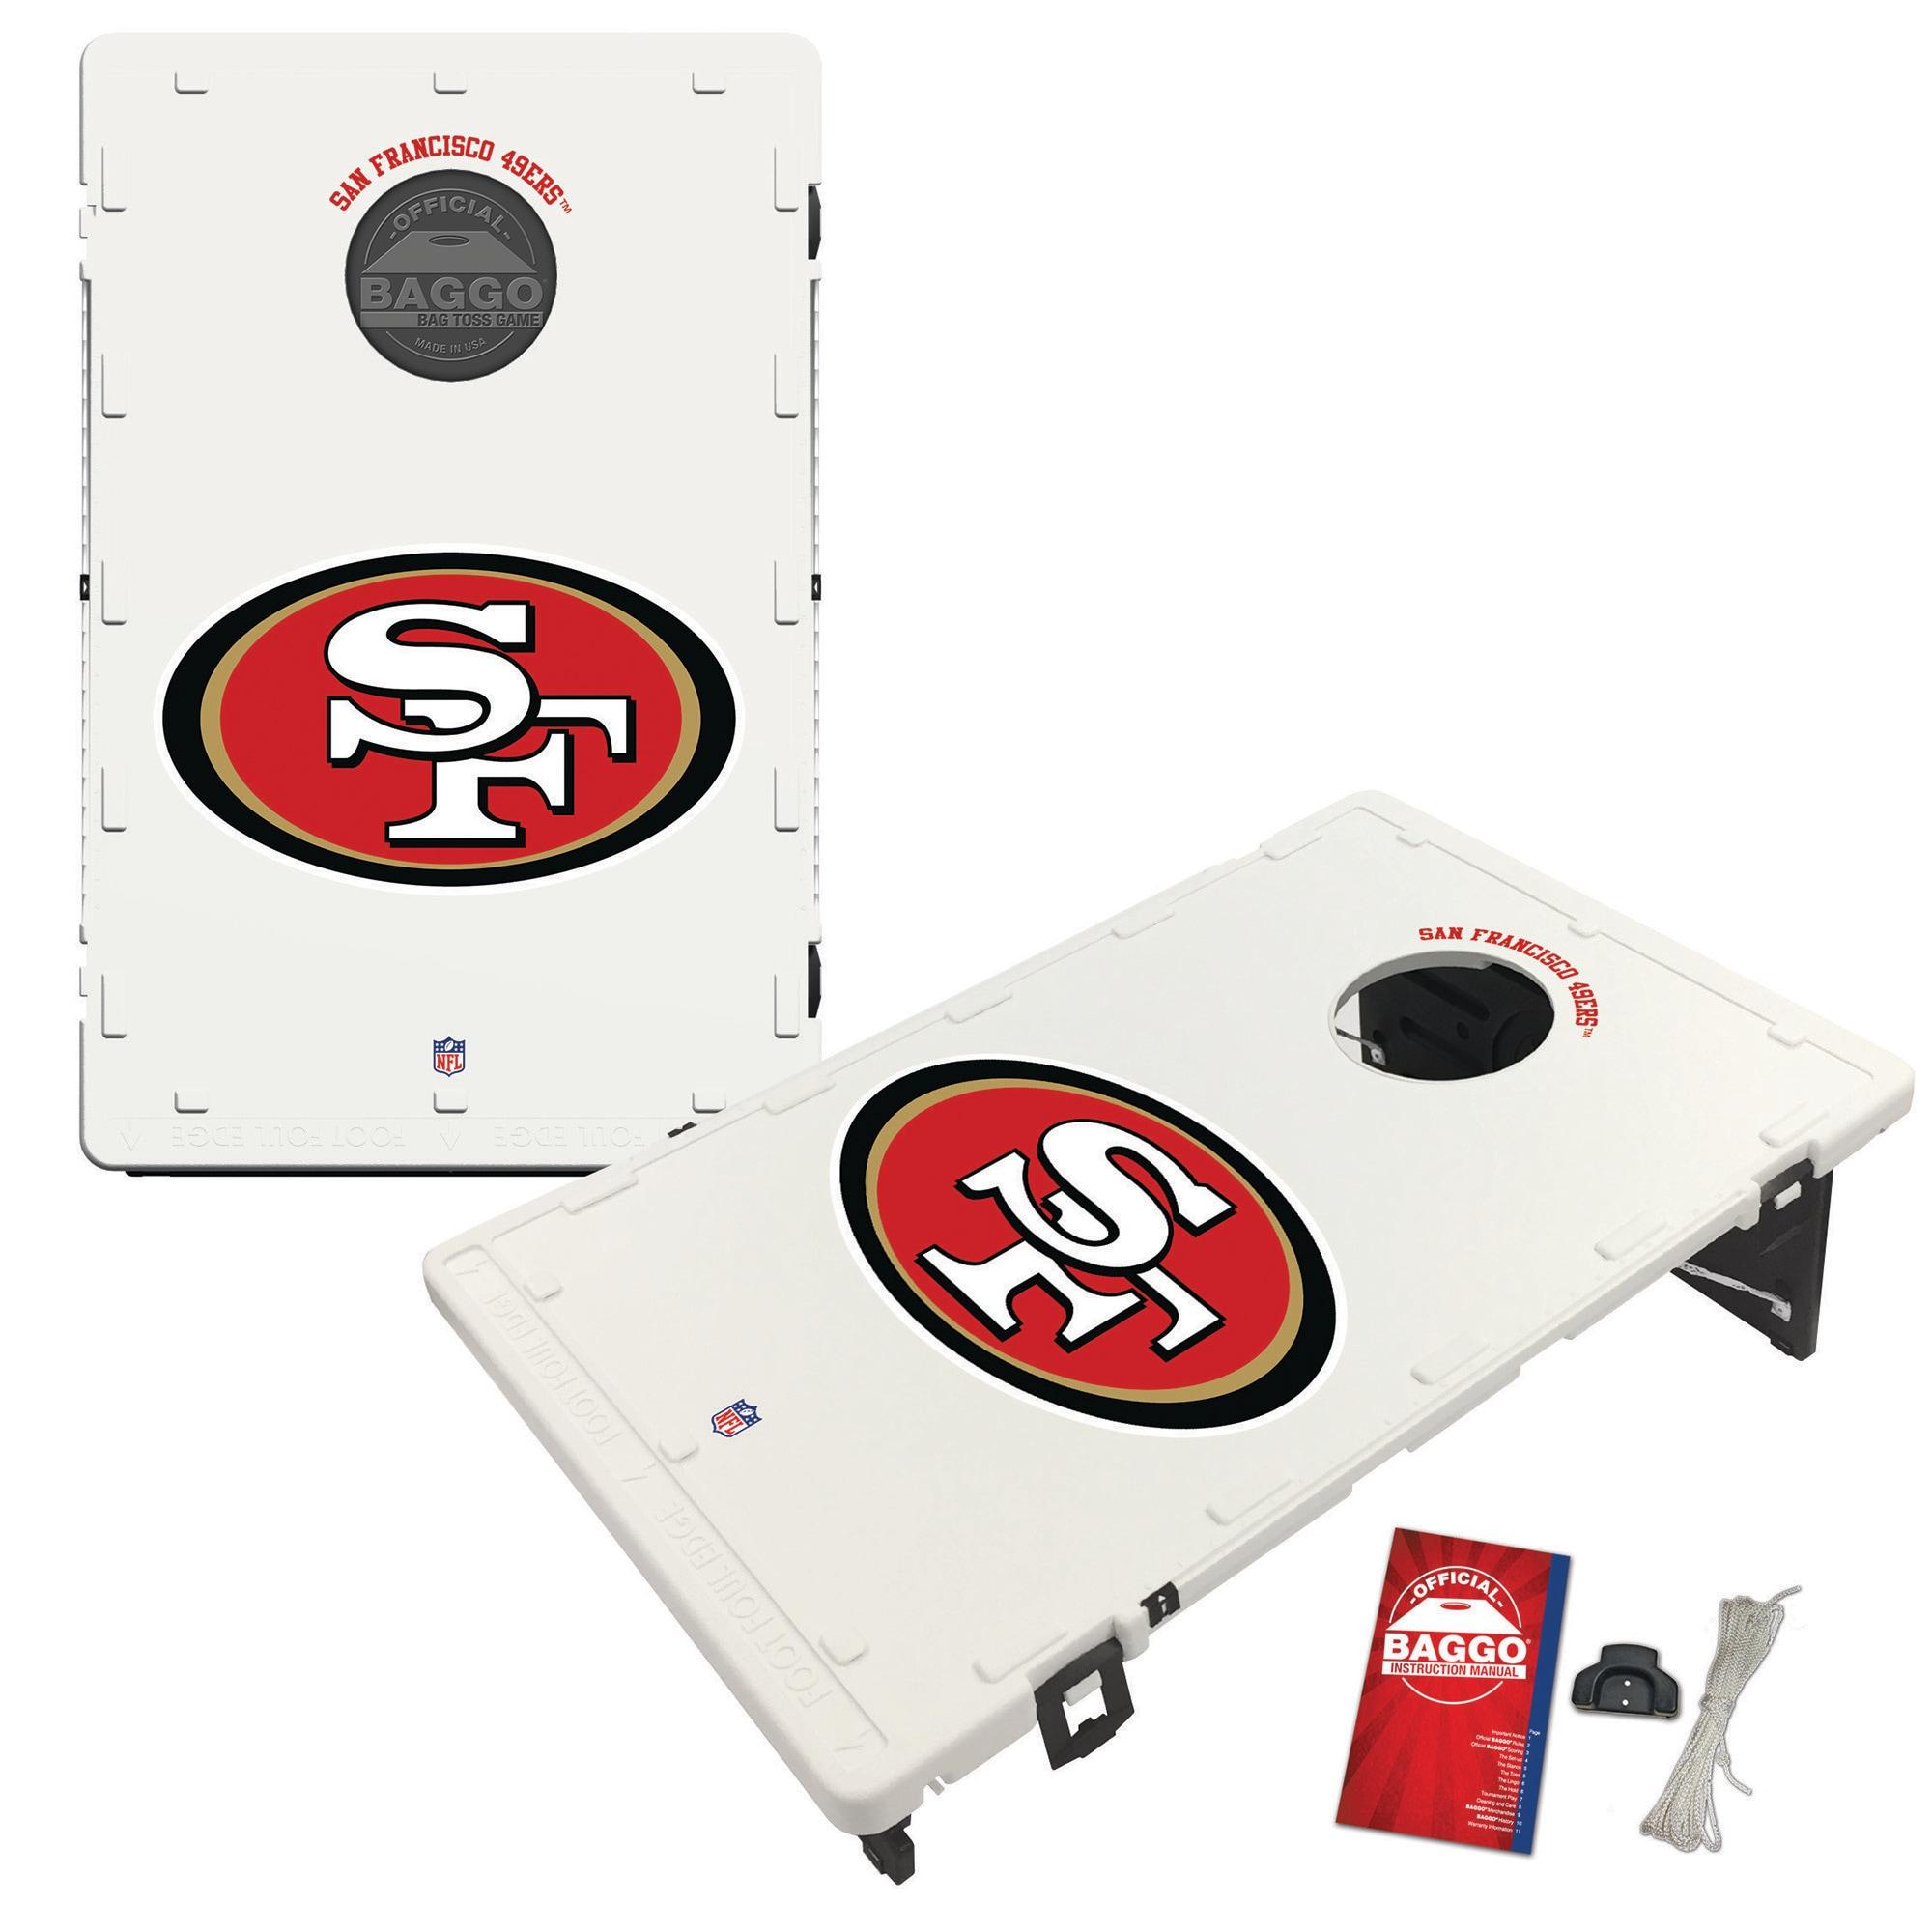 San Francisco 49ers 2' x 3' Classic Design BAGGO Cornhole Board Tailgate Toss Set